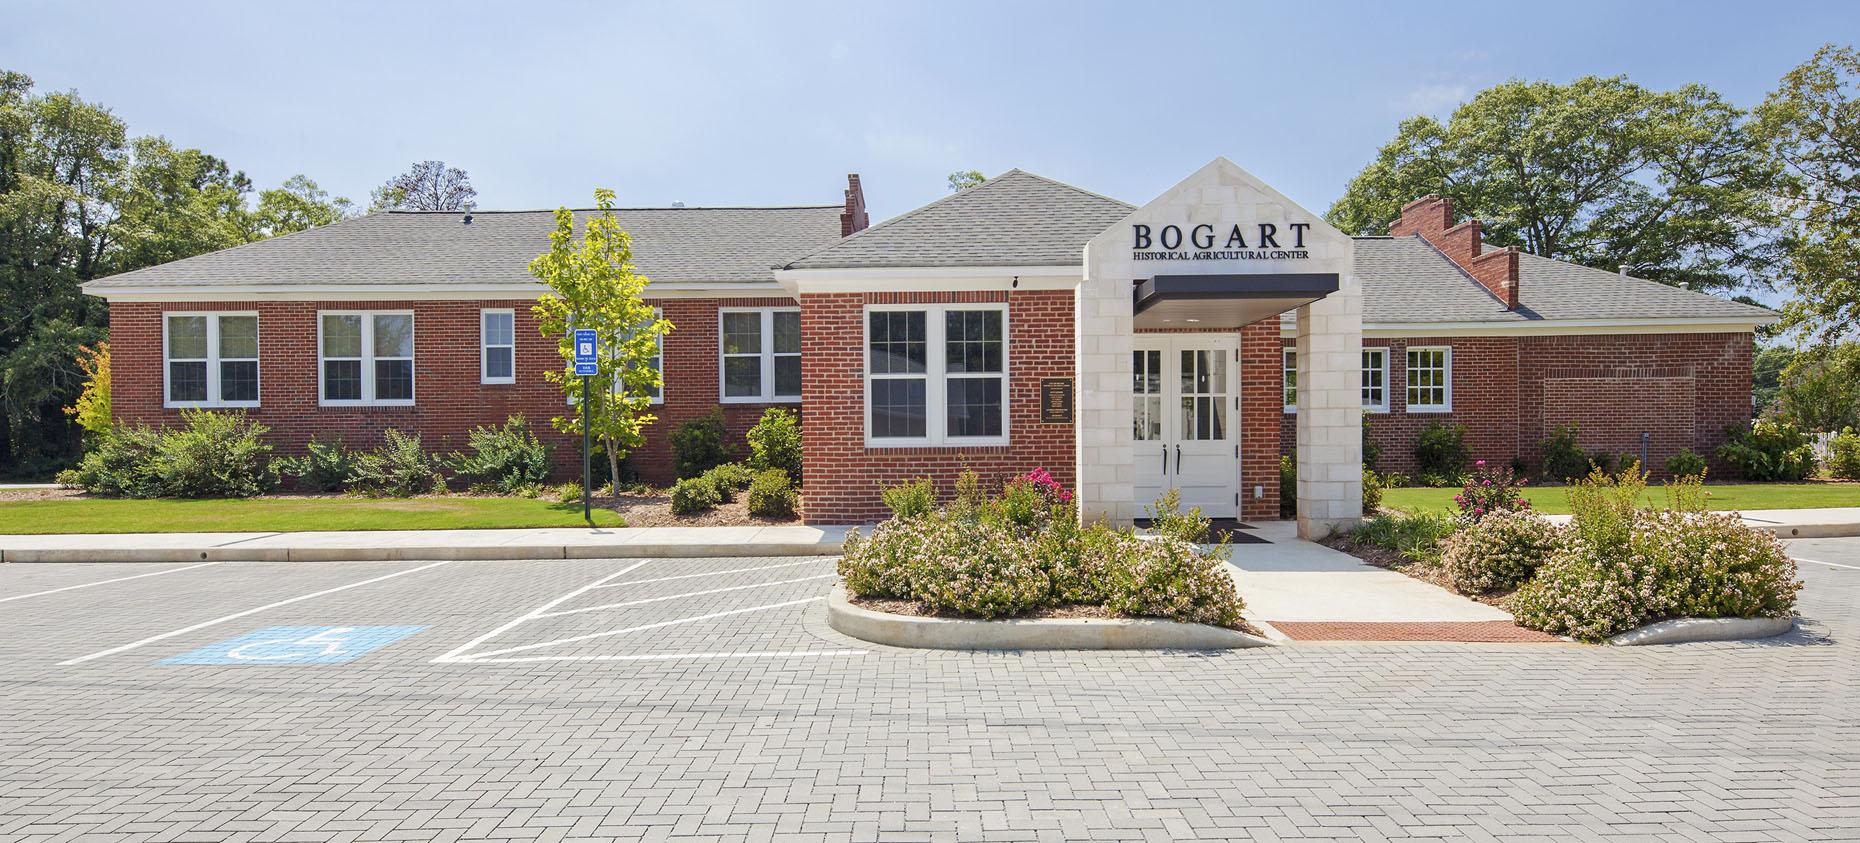 BOGART VOCATIONAL SCHOOL RENOVATION